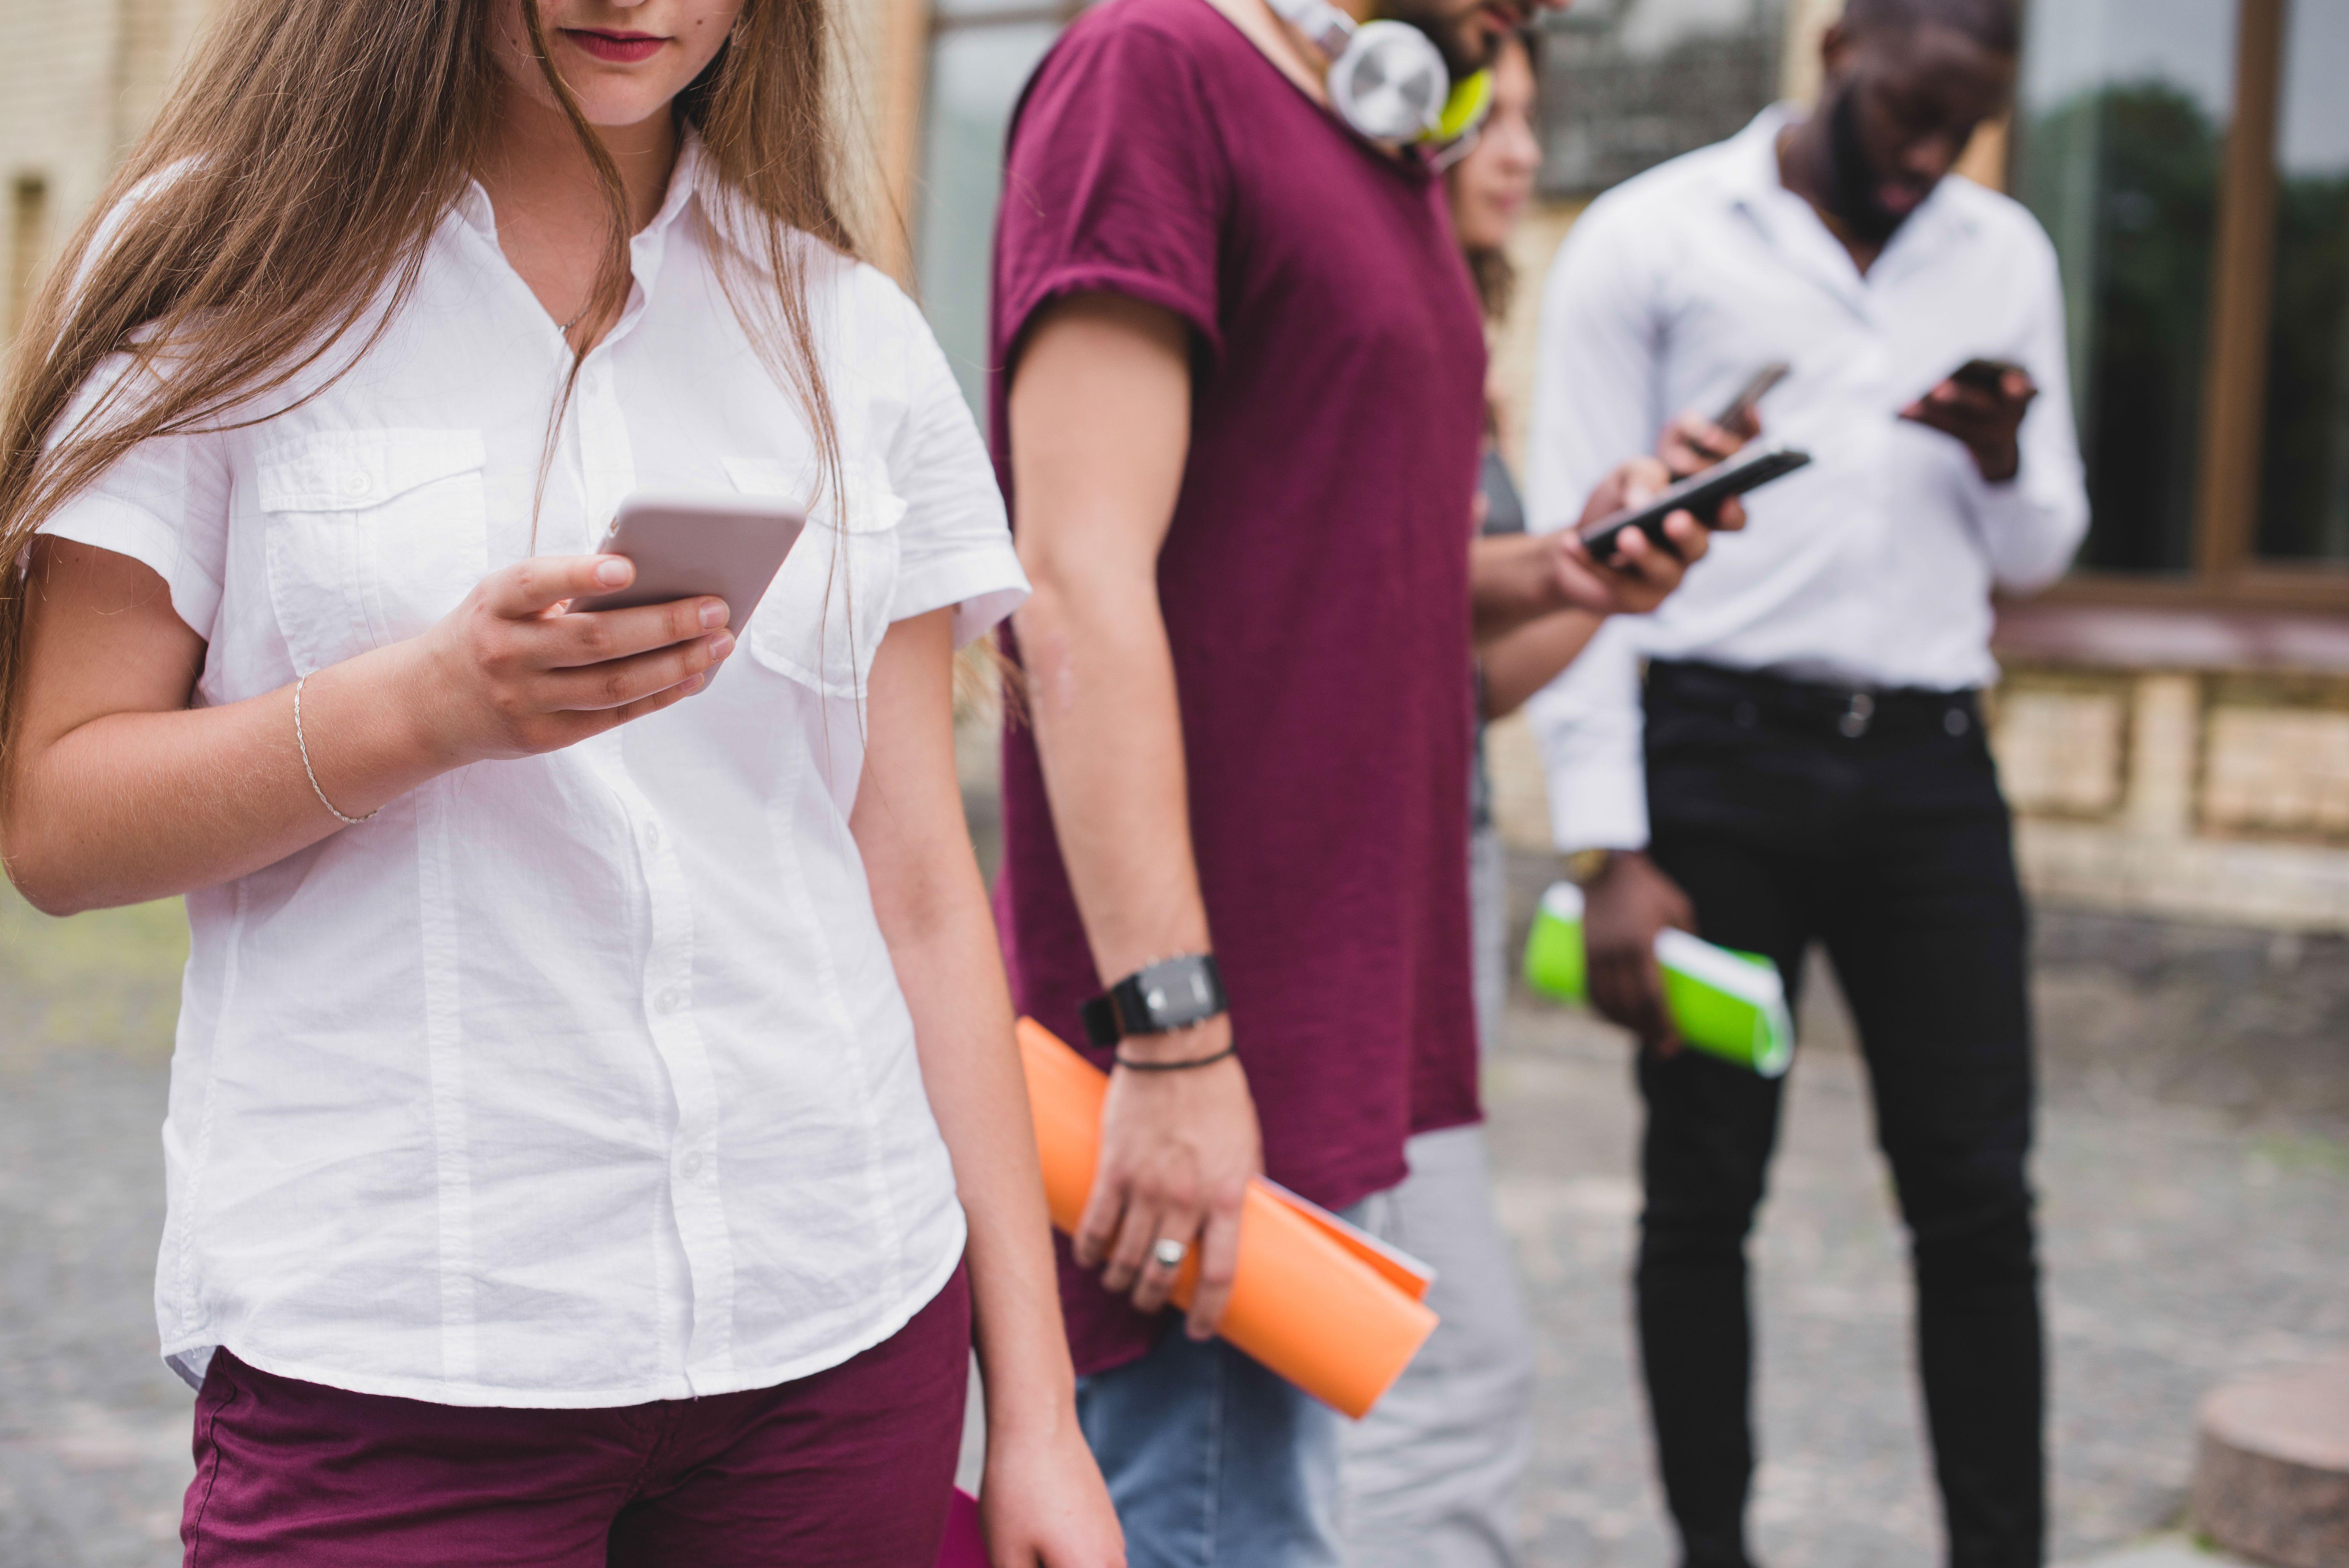 People using smartphone